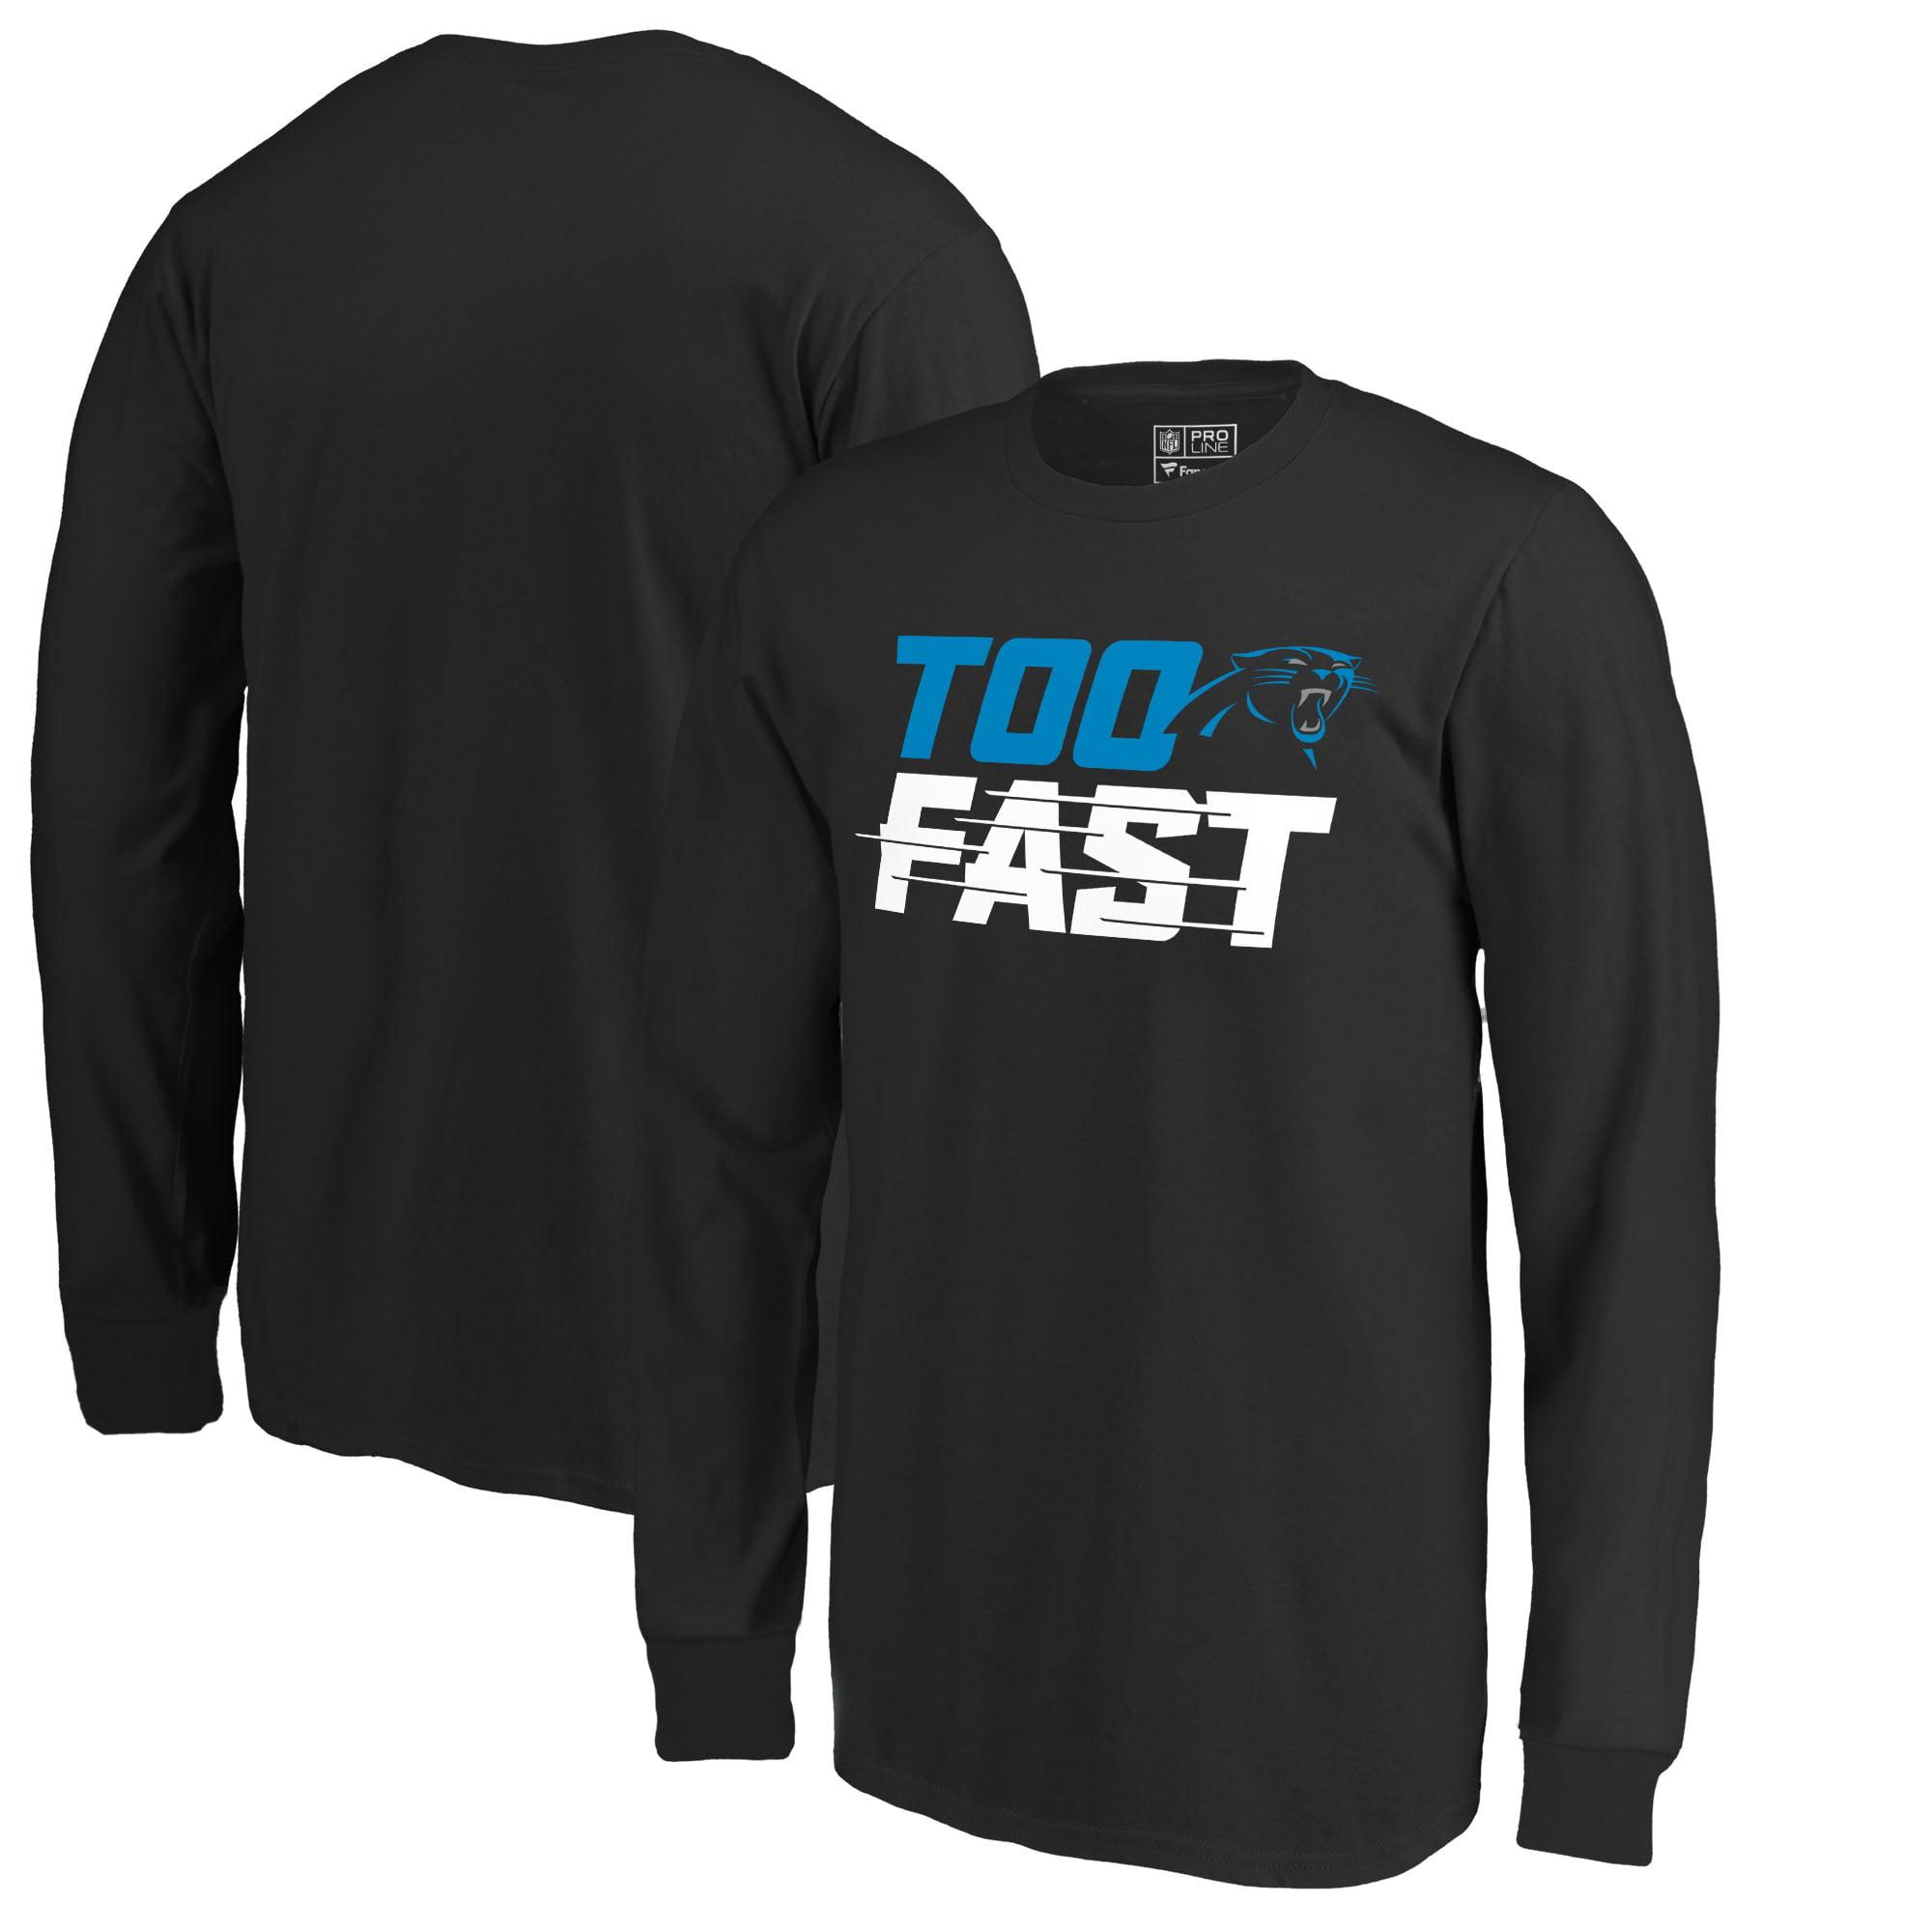 Carolina Panthers Fanatics Branded Youth Too Fast Long Sleeve T-Shirt - Black